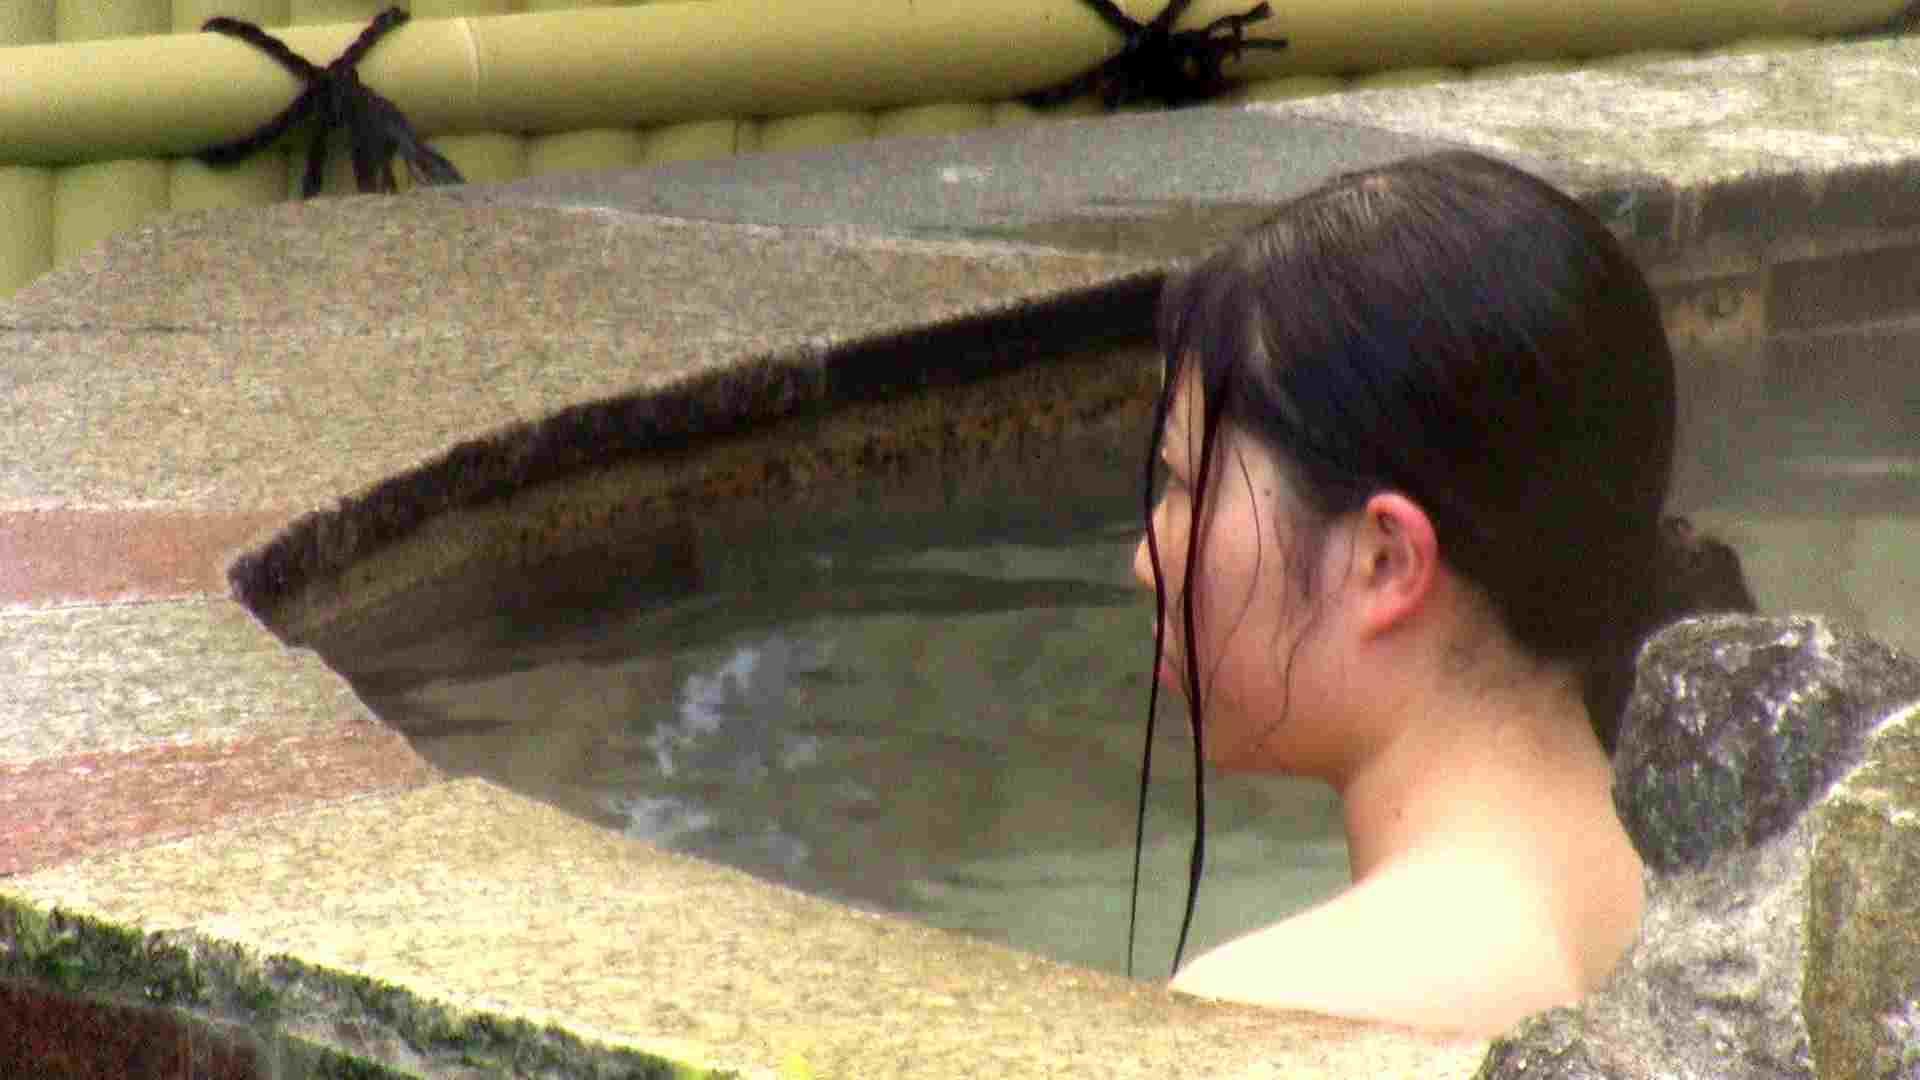 Aquaな露天風呂Vol.218 OLエロ画像 盗撮オマンコ無修正動画無料 81PICs 77